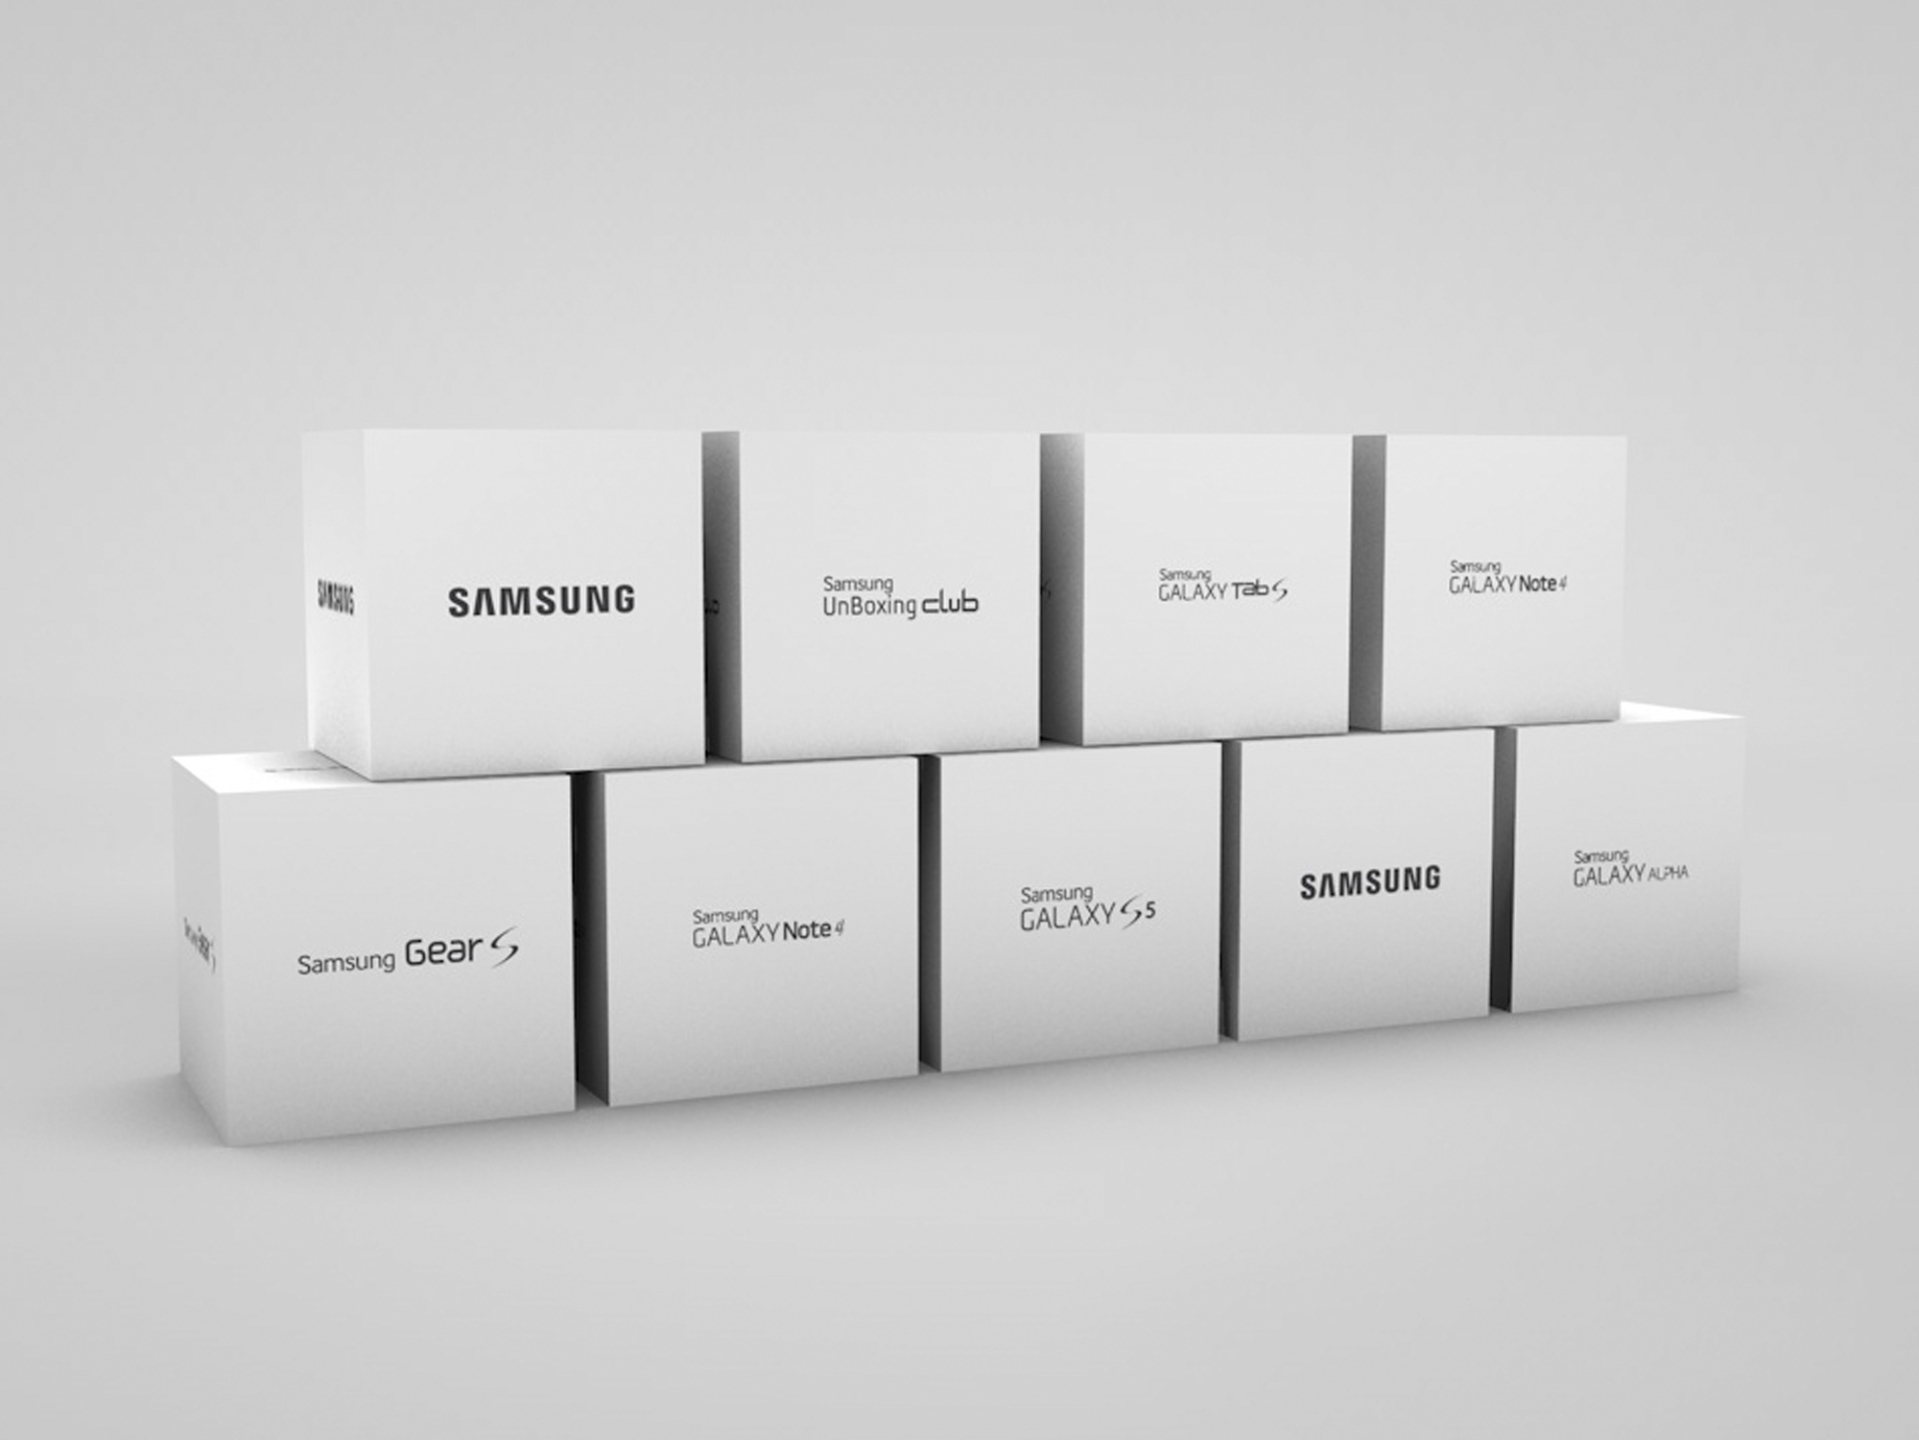 Samsung-SES-img-004